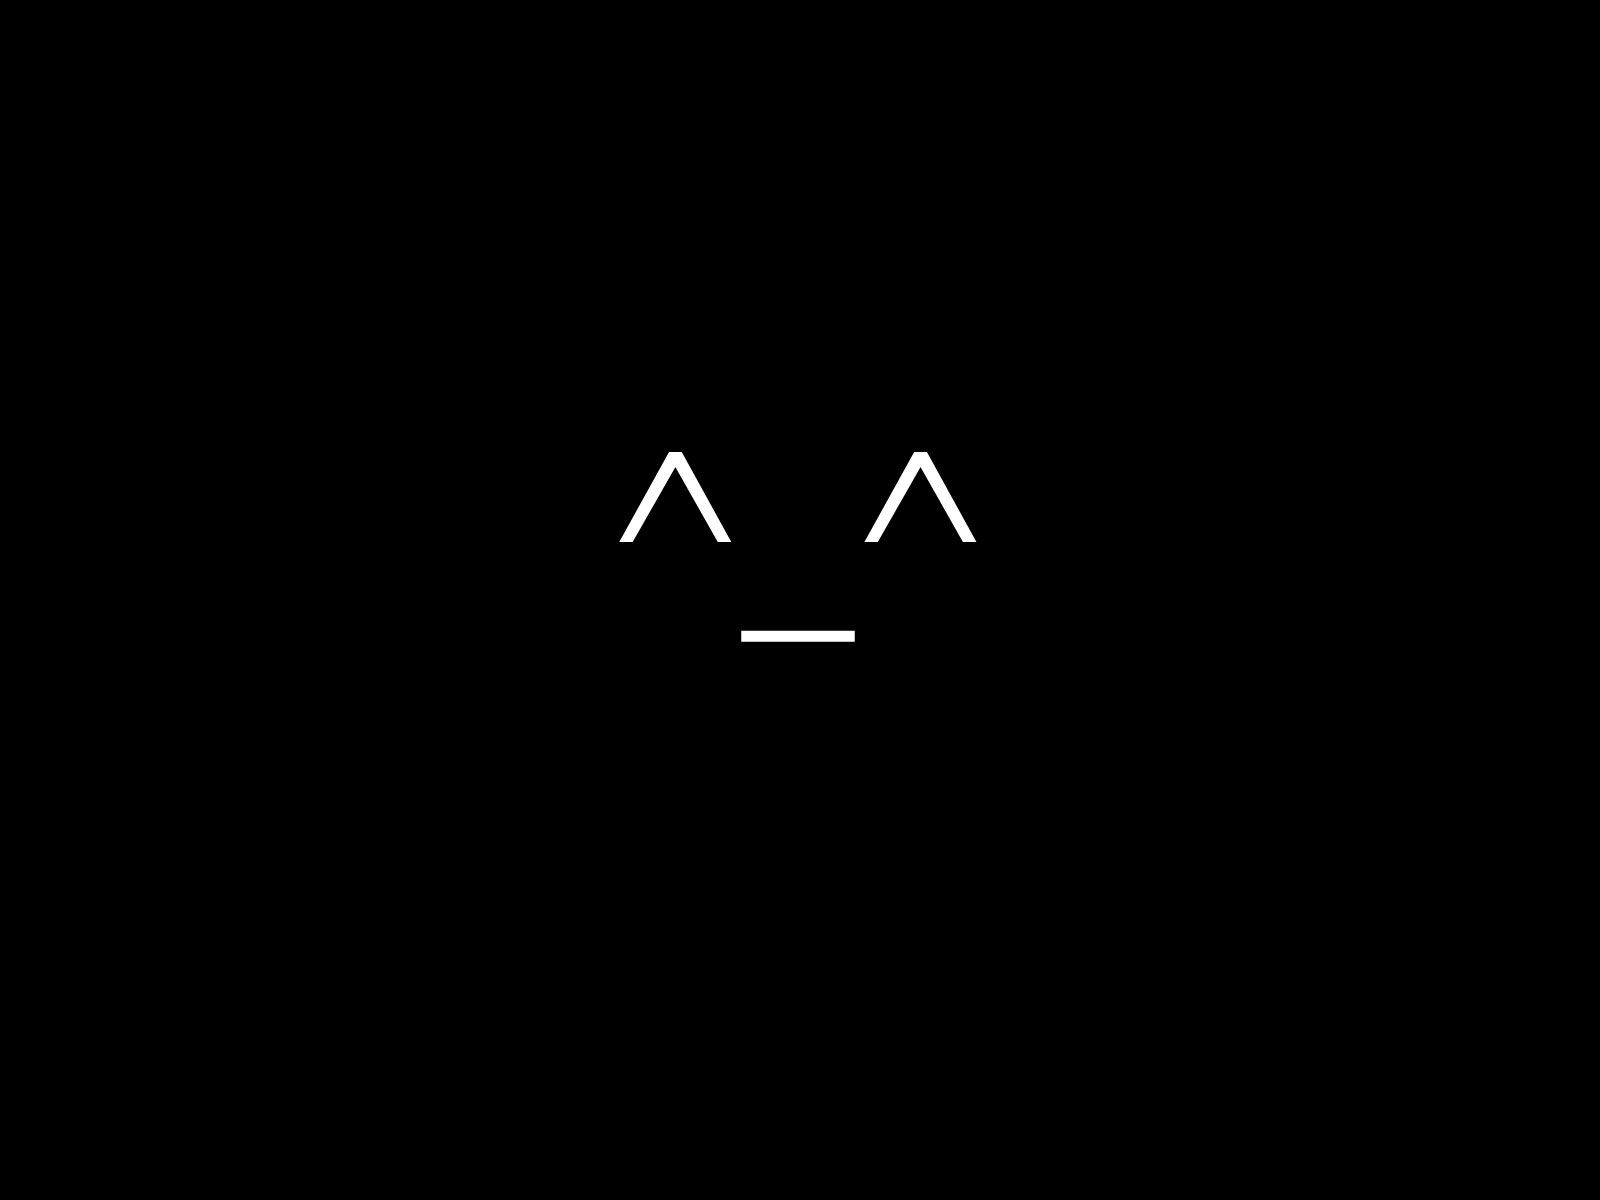 Minimalistic Smiley Face Emoticon 1600x1200 Wallpaper Apple Wallpaper Wallpaper Backgrounds Phone Wallpapers